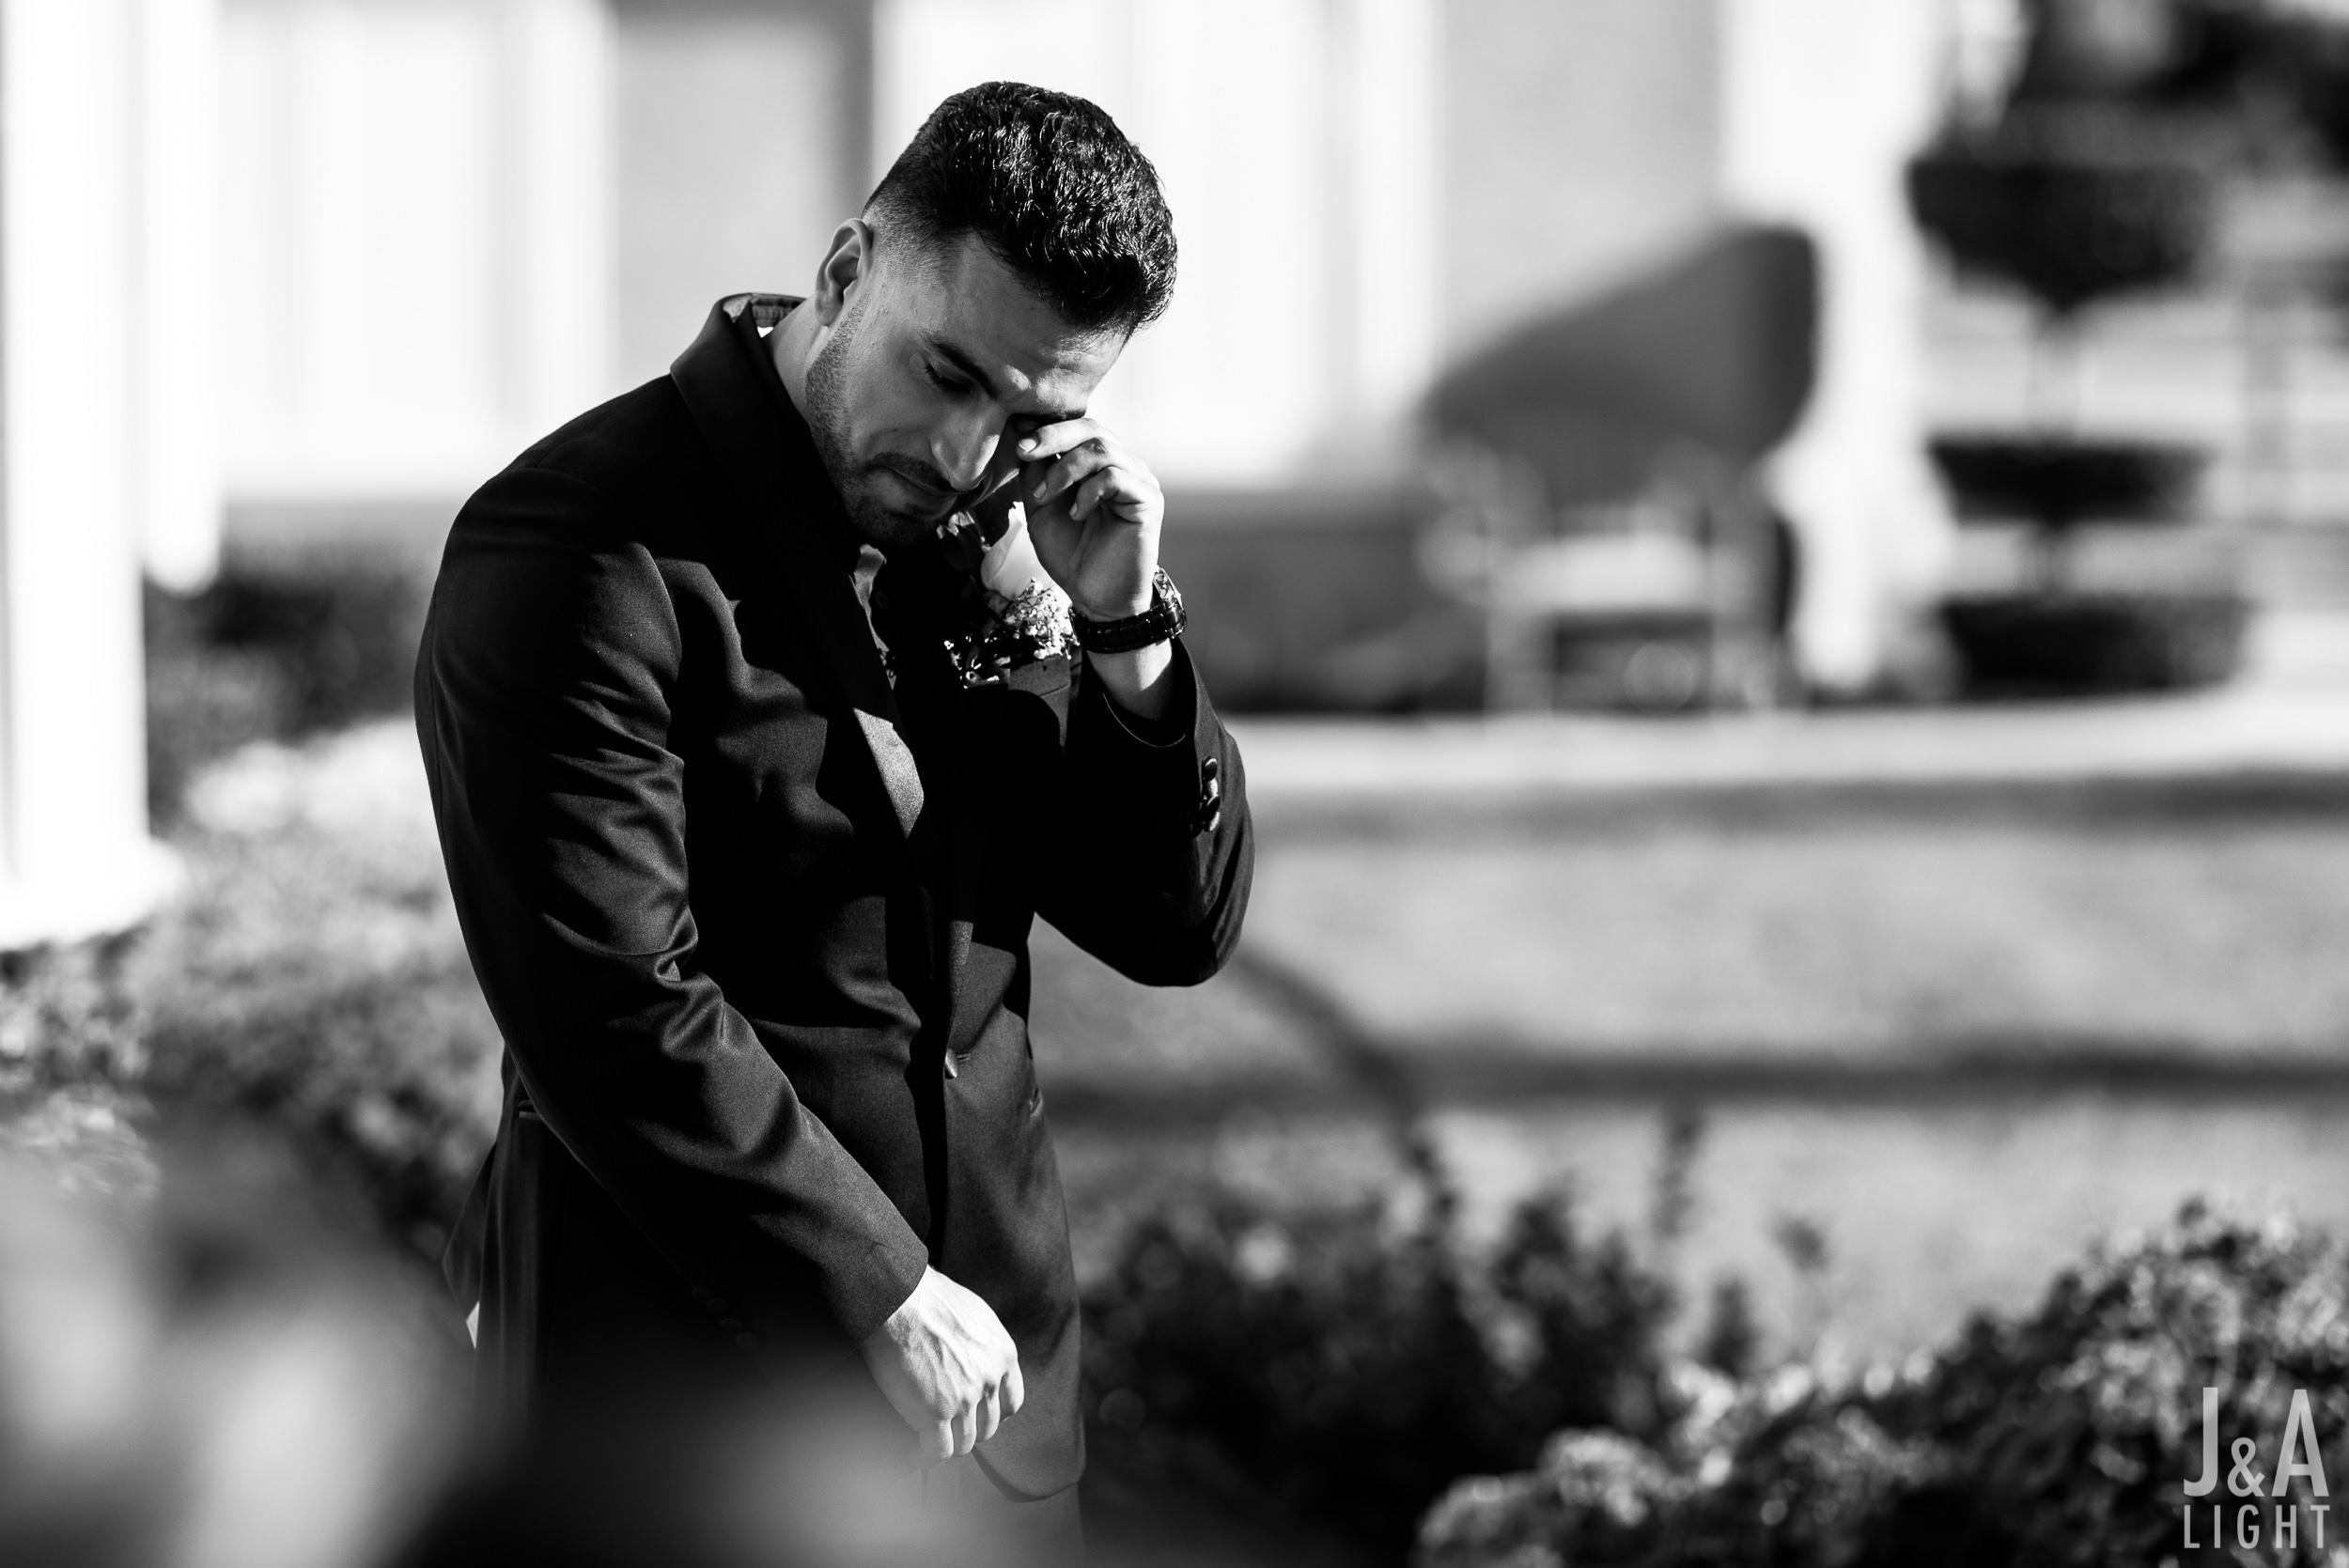 20171014-JanDan-LosBanos-GlassMansion-Wedding-Blog-033.jpg